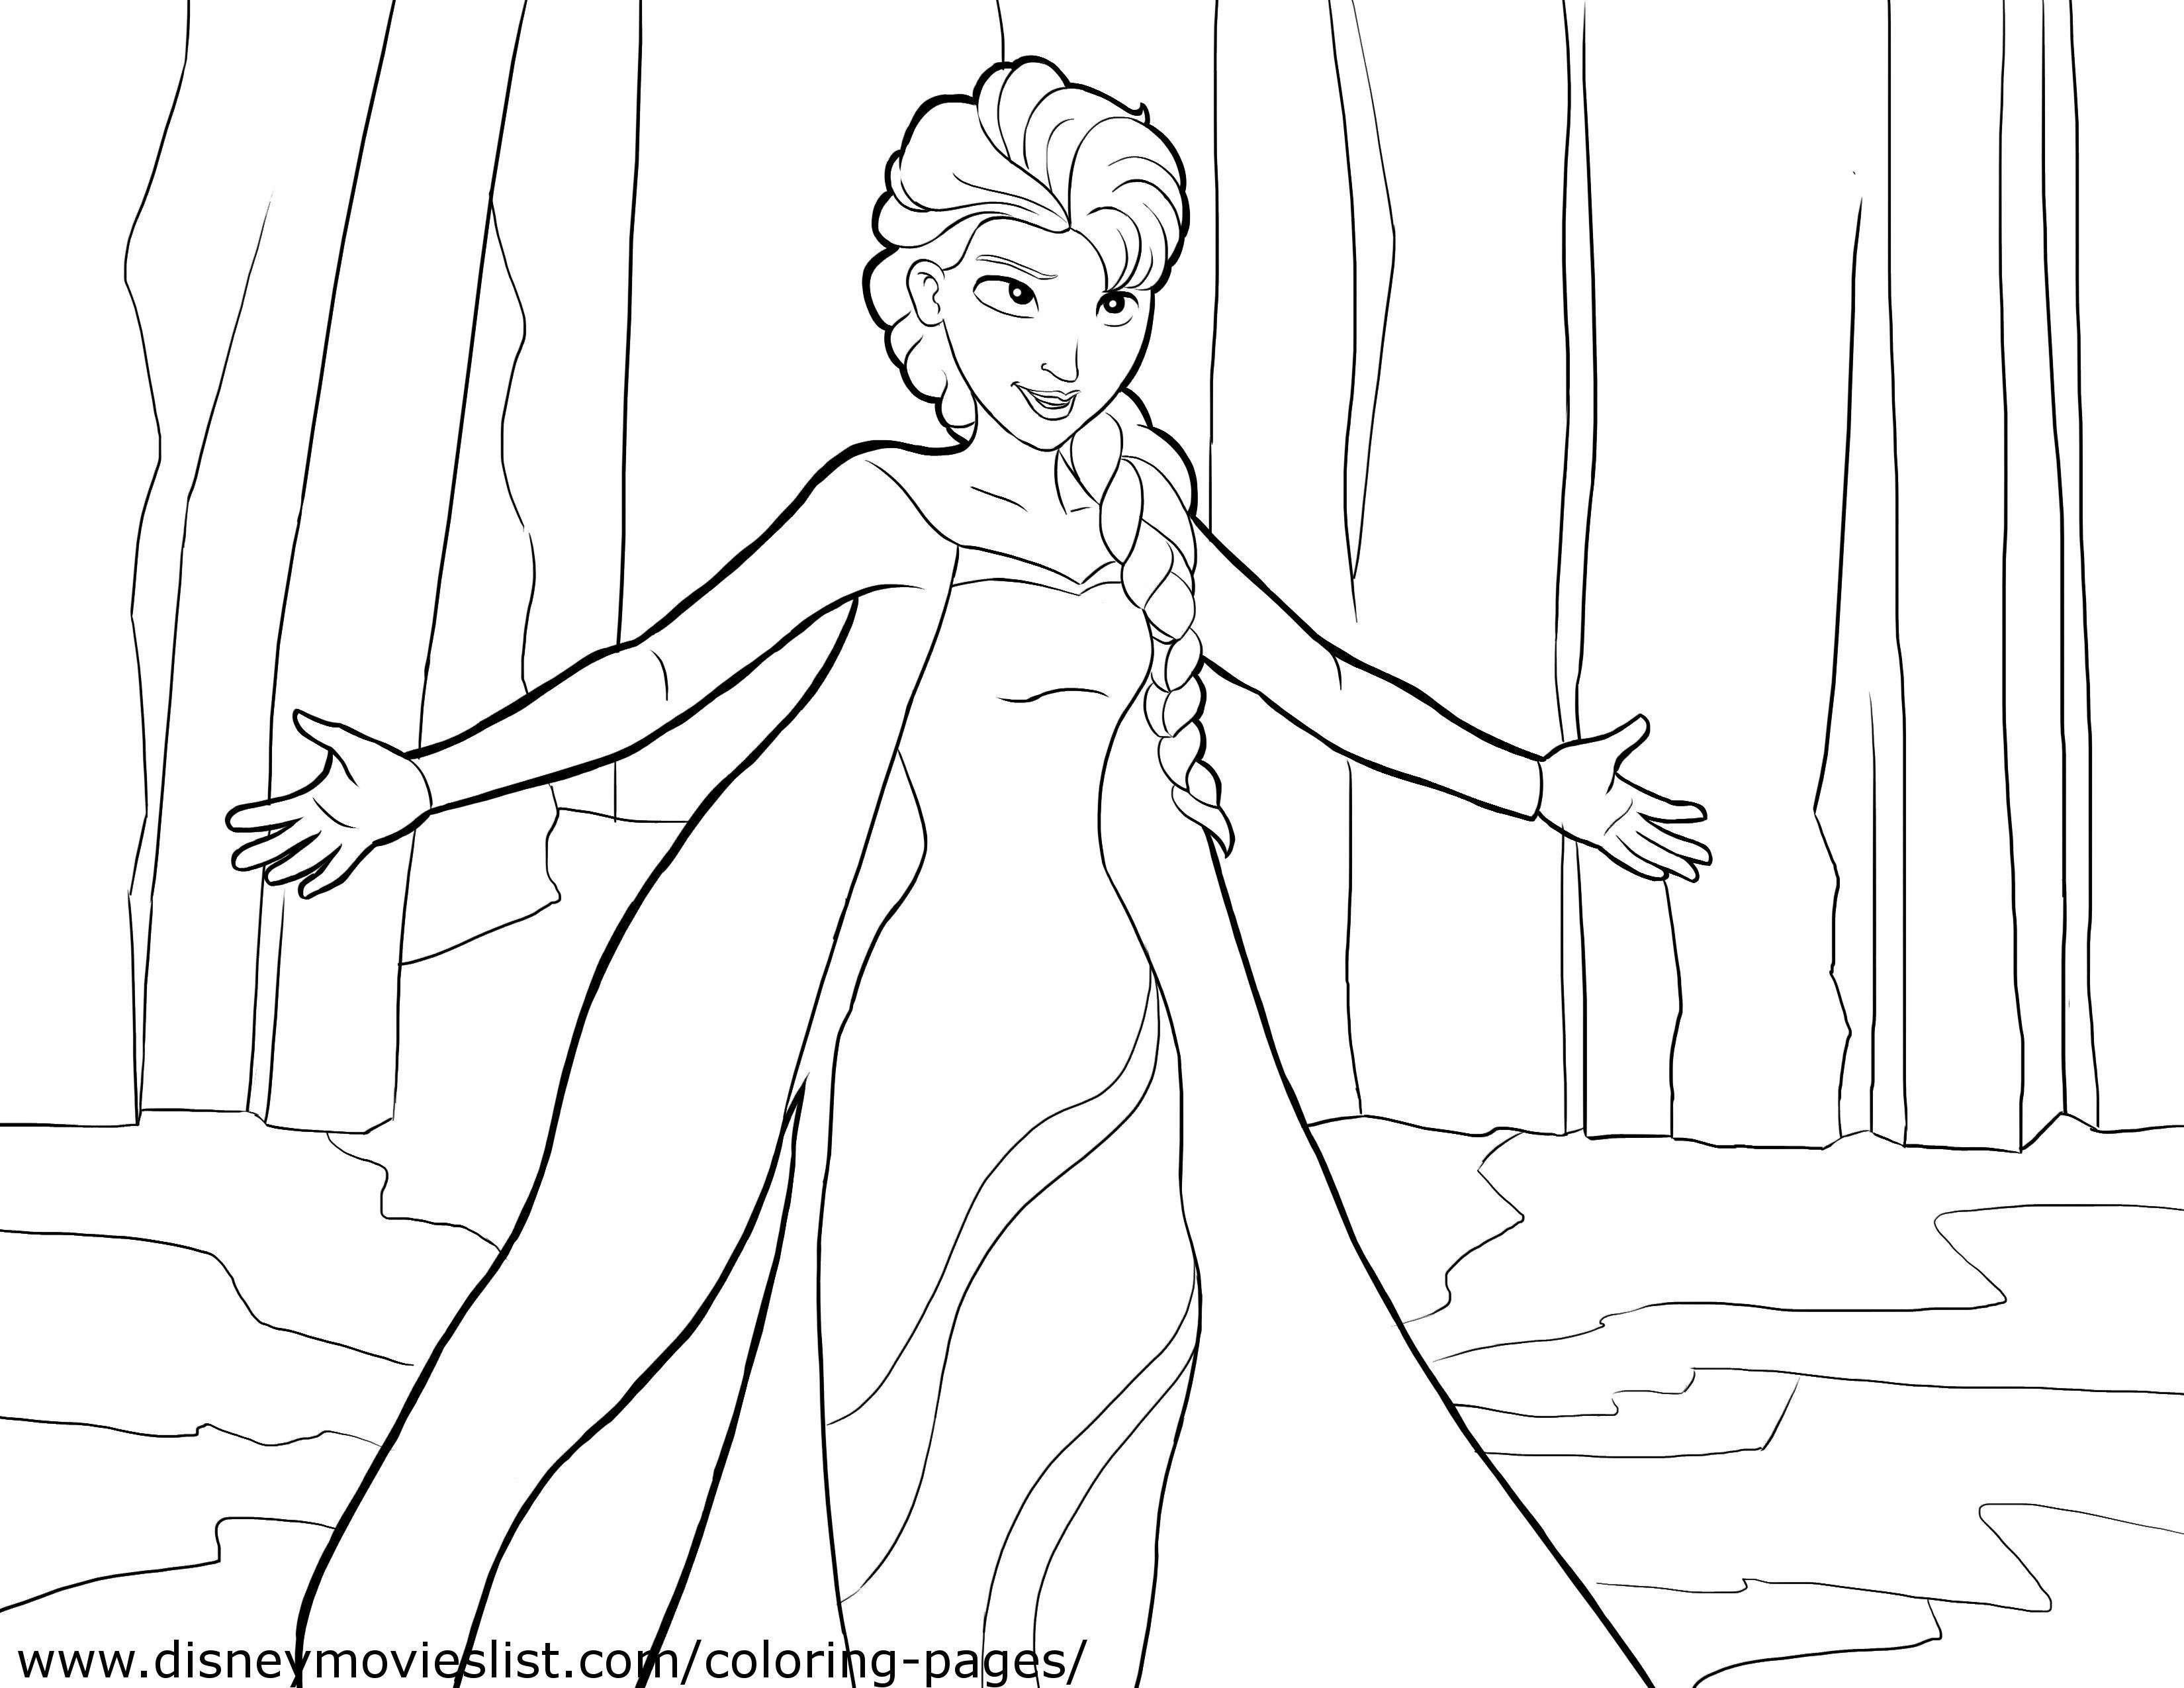 Olaf Frozen Ausmalbilder Neu 37 Anna Elsa Olaf Ausmalbilder Scoredatscore Frisch Ana Und Elsa Sammlung